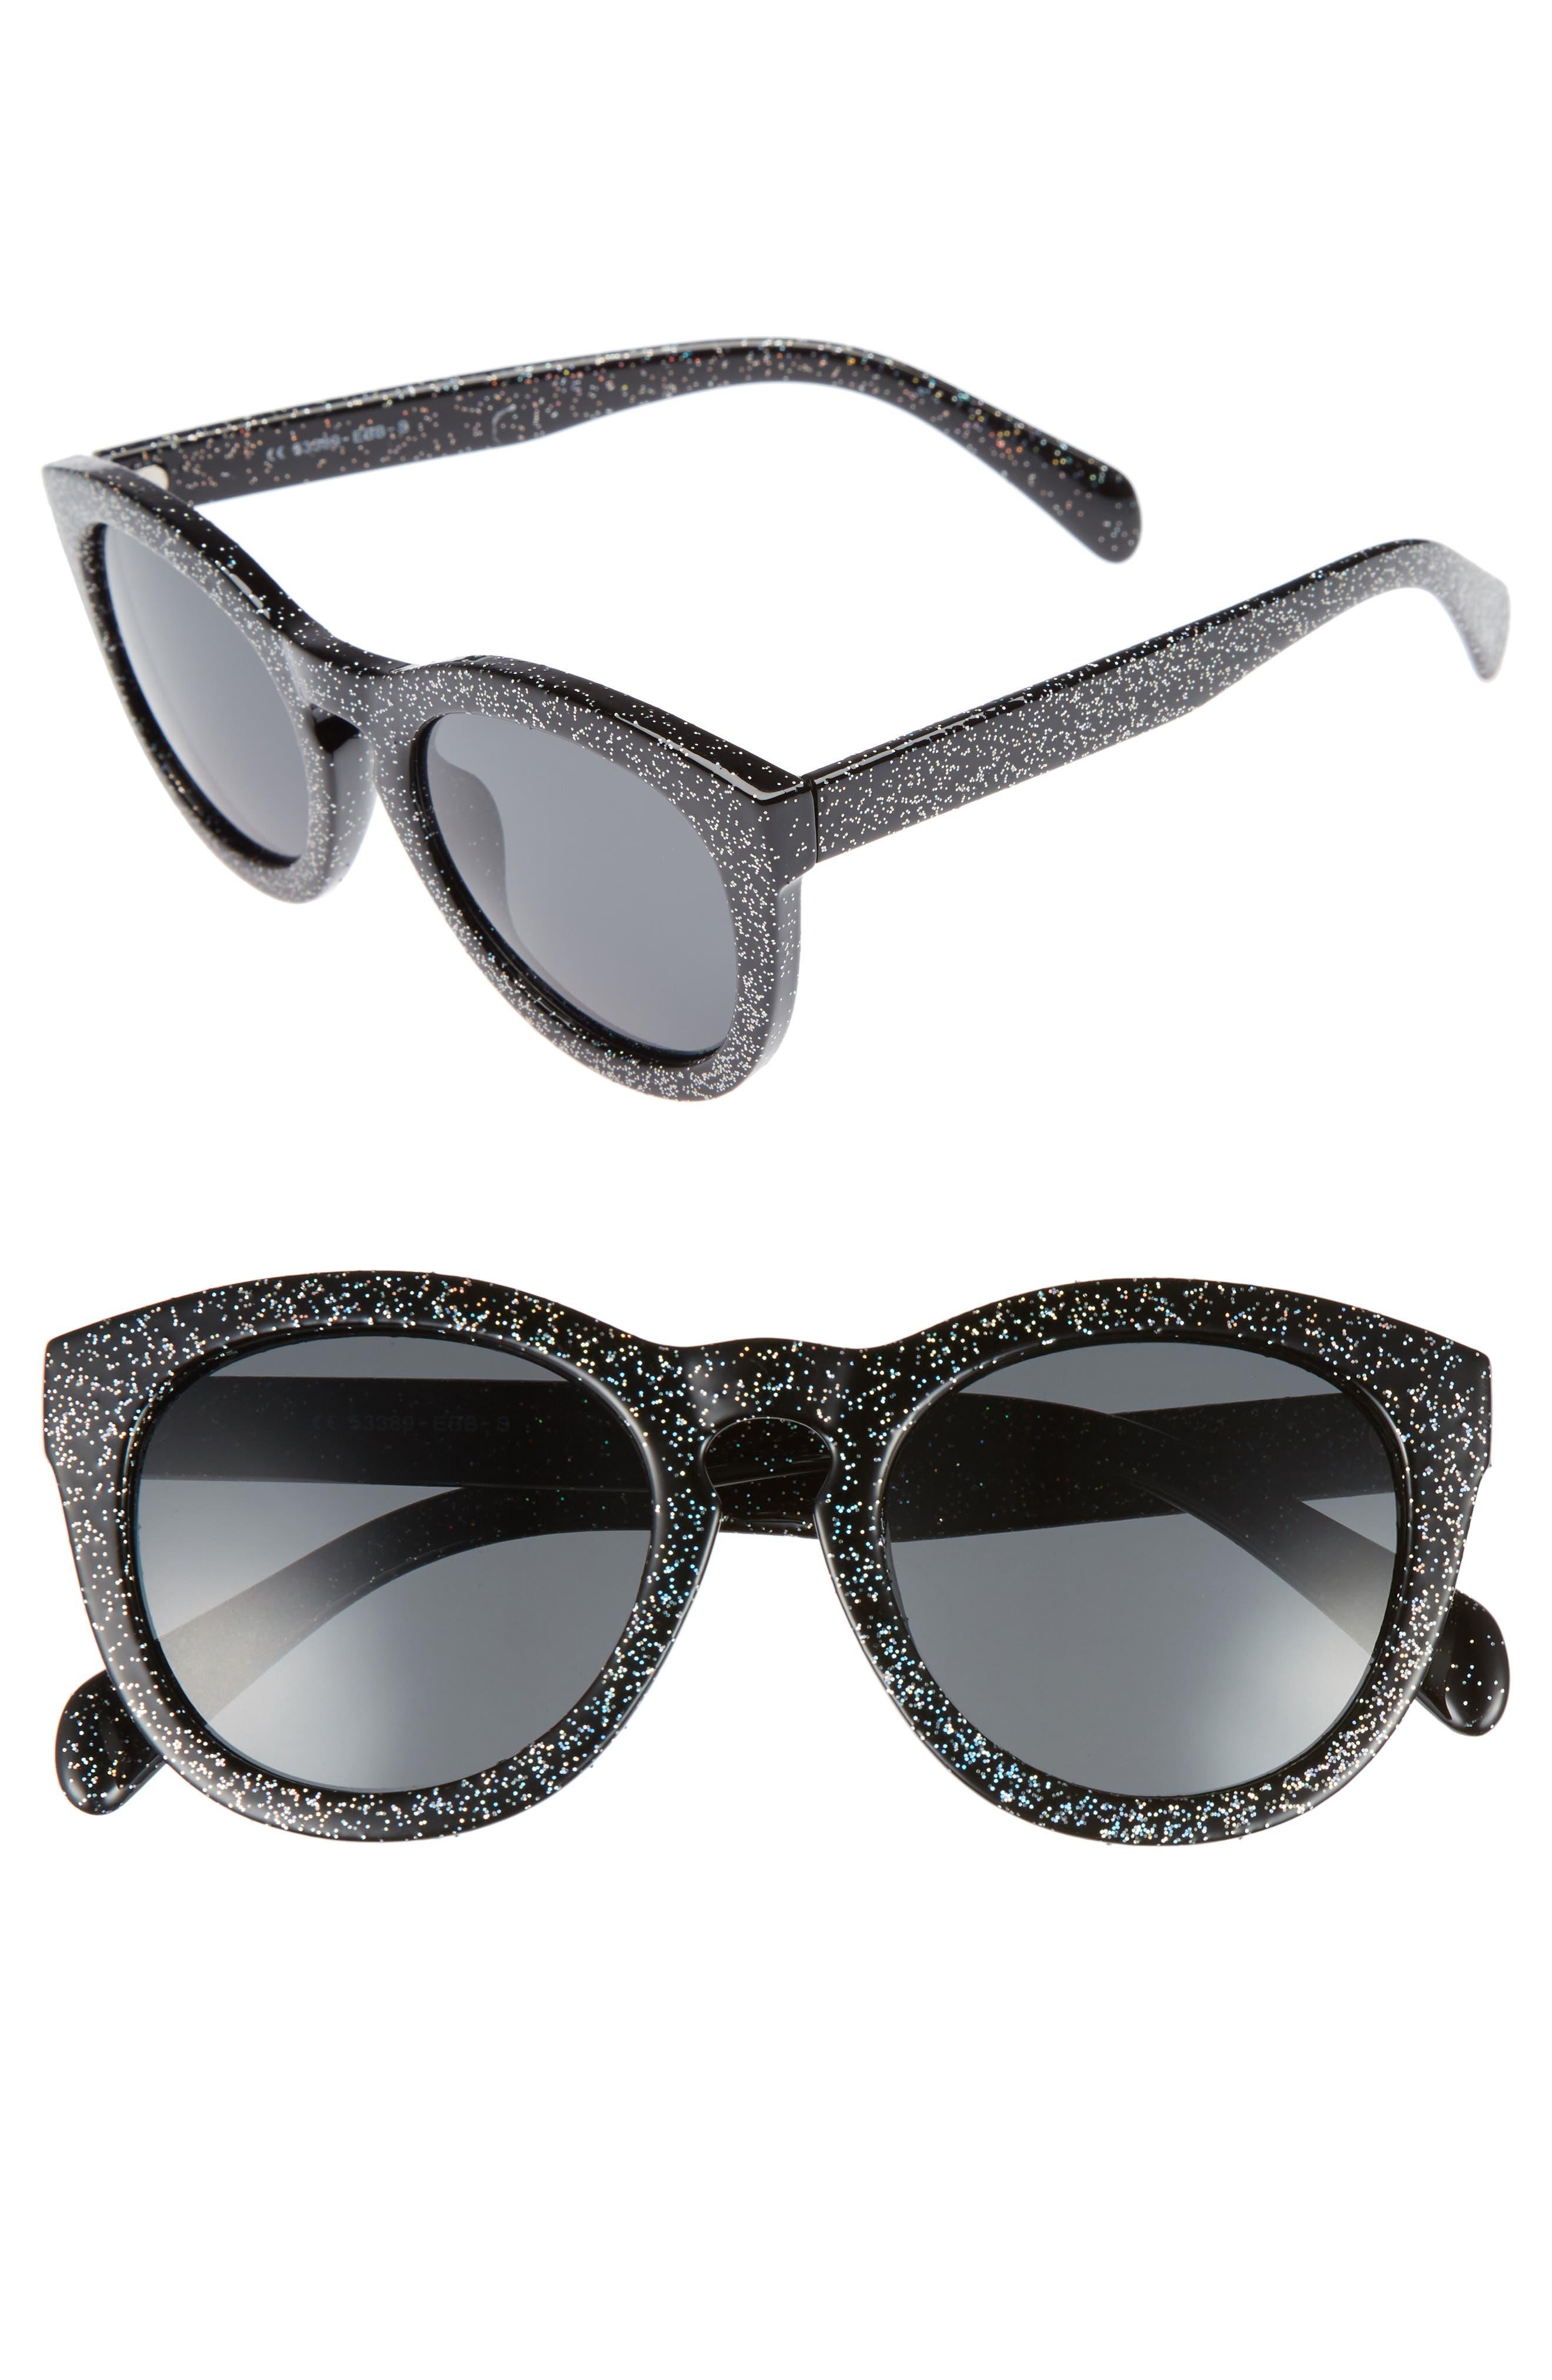 50mm Glitter Round Sunglasses,                             Main thumbnail 1, color,